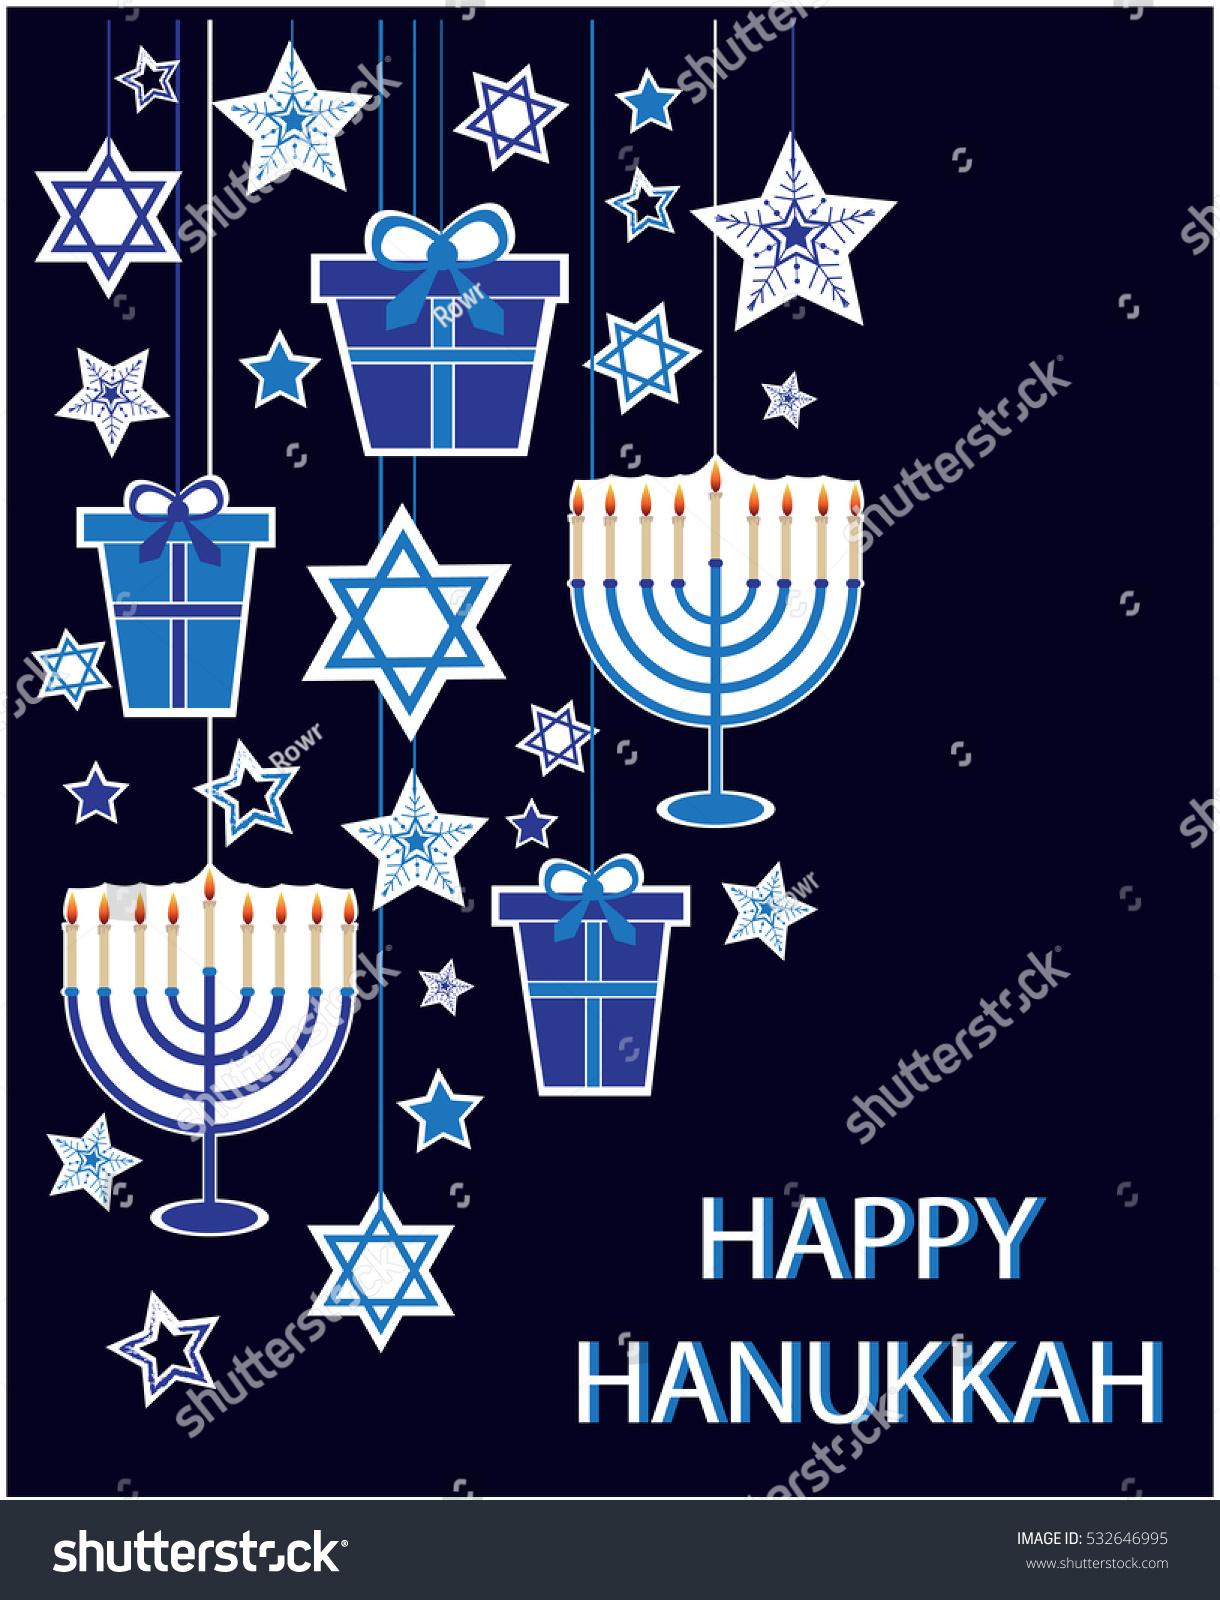 Happy Hanukkah Greeting Card Background Vector Stock Vector 2018